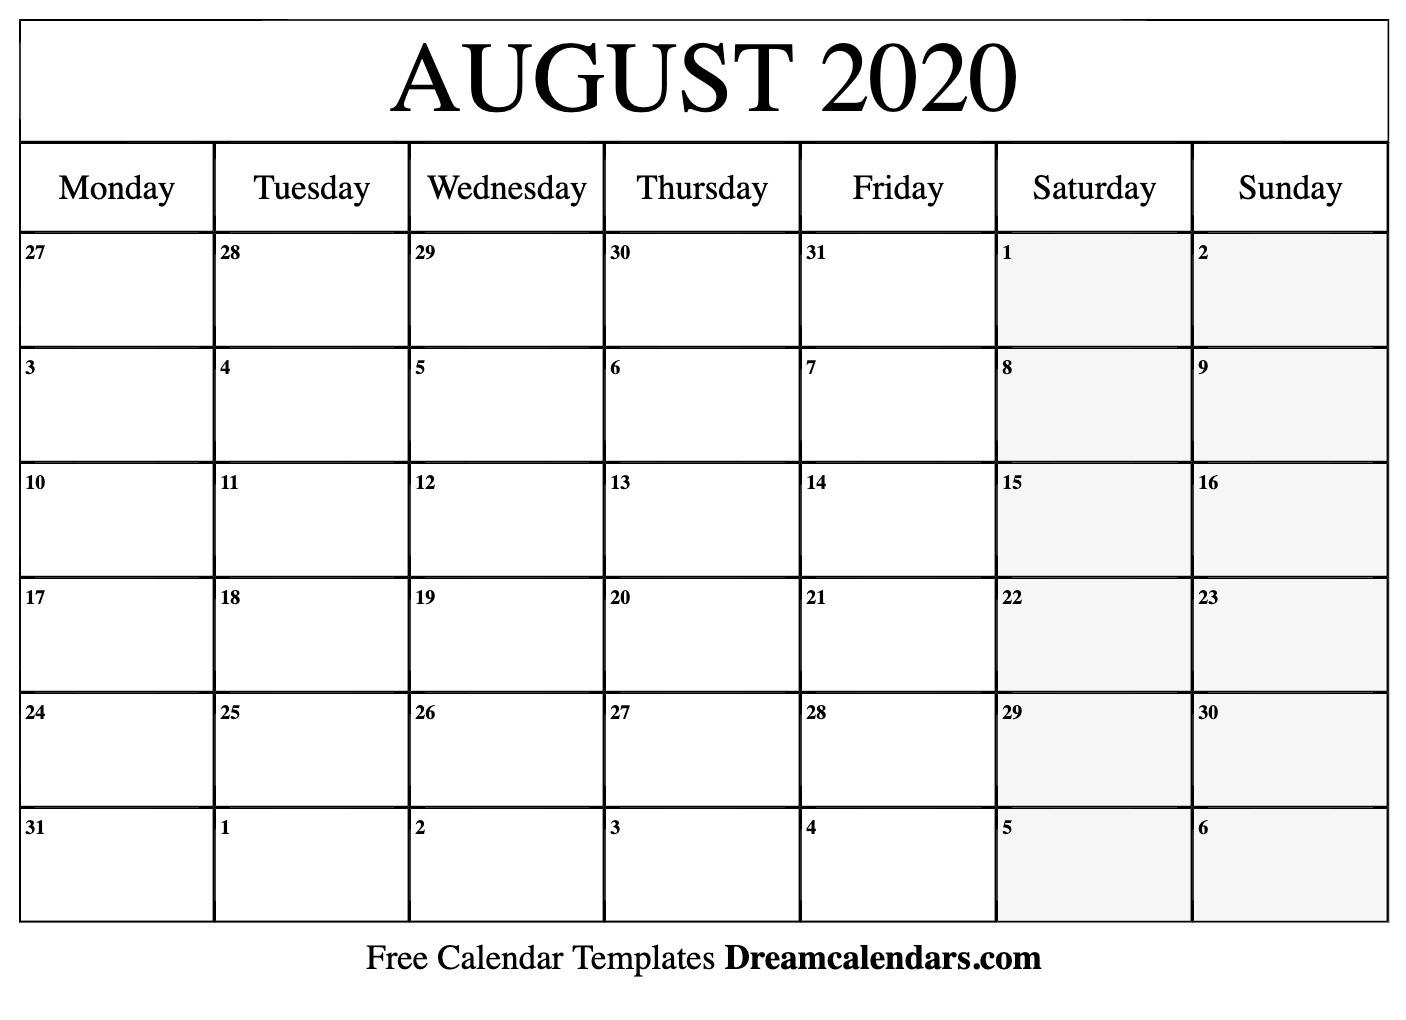 Printable August 2020 Calendar Templates  Helena Orstem intended for August 2020 Calendar Printable